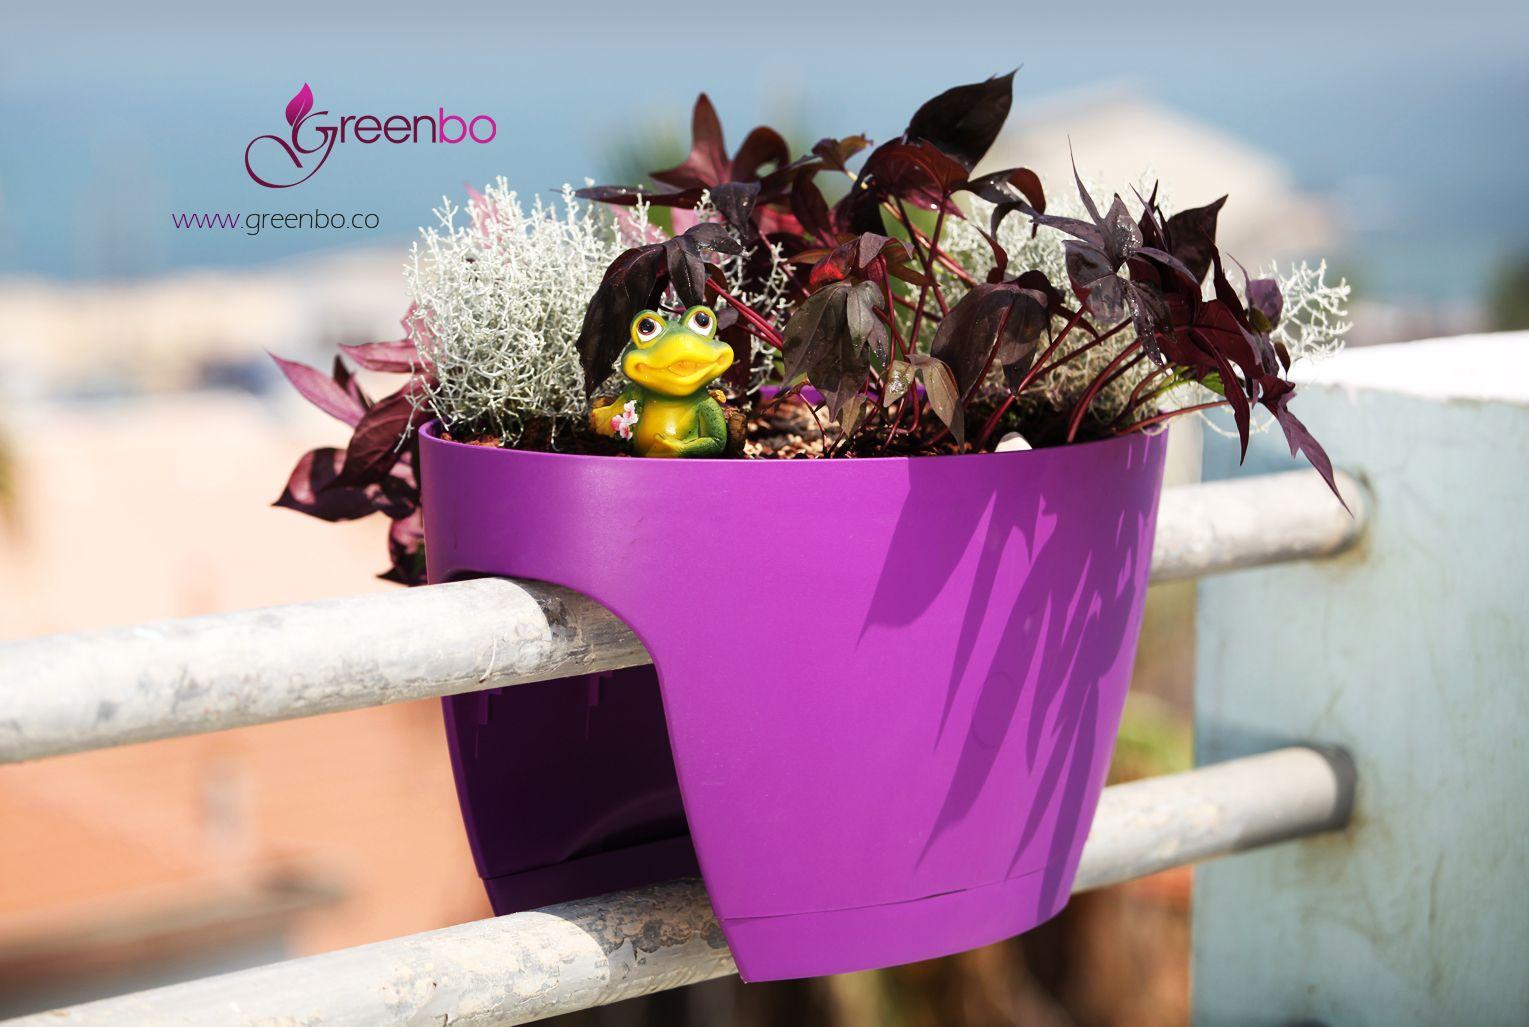 Greenbo Xl Railing Flower Box Creates Your Nature Design Harmony